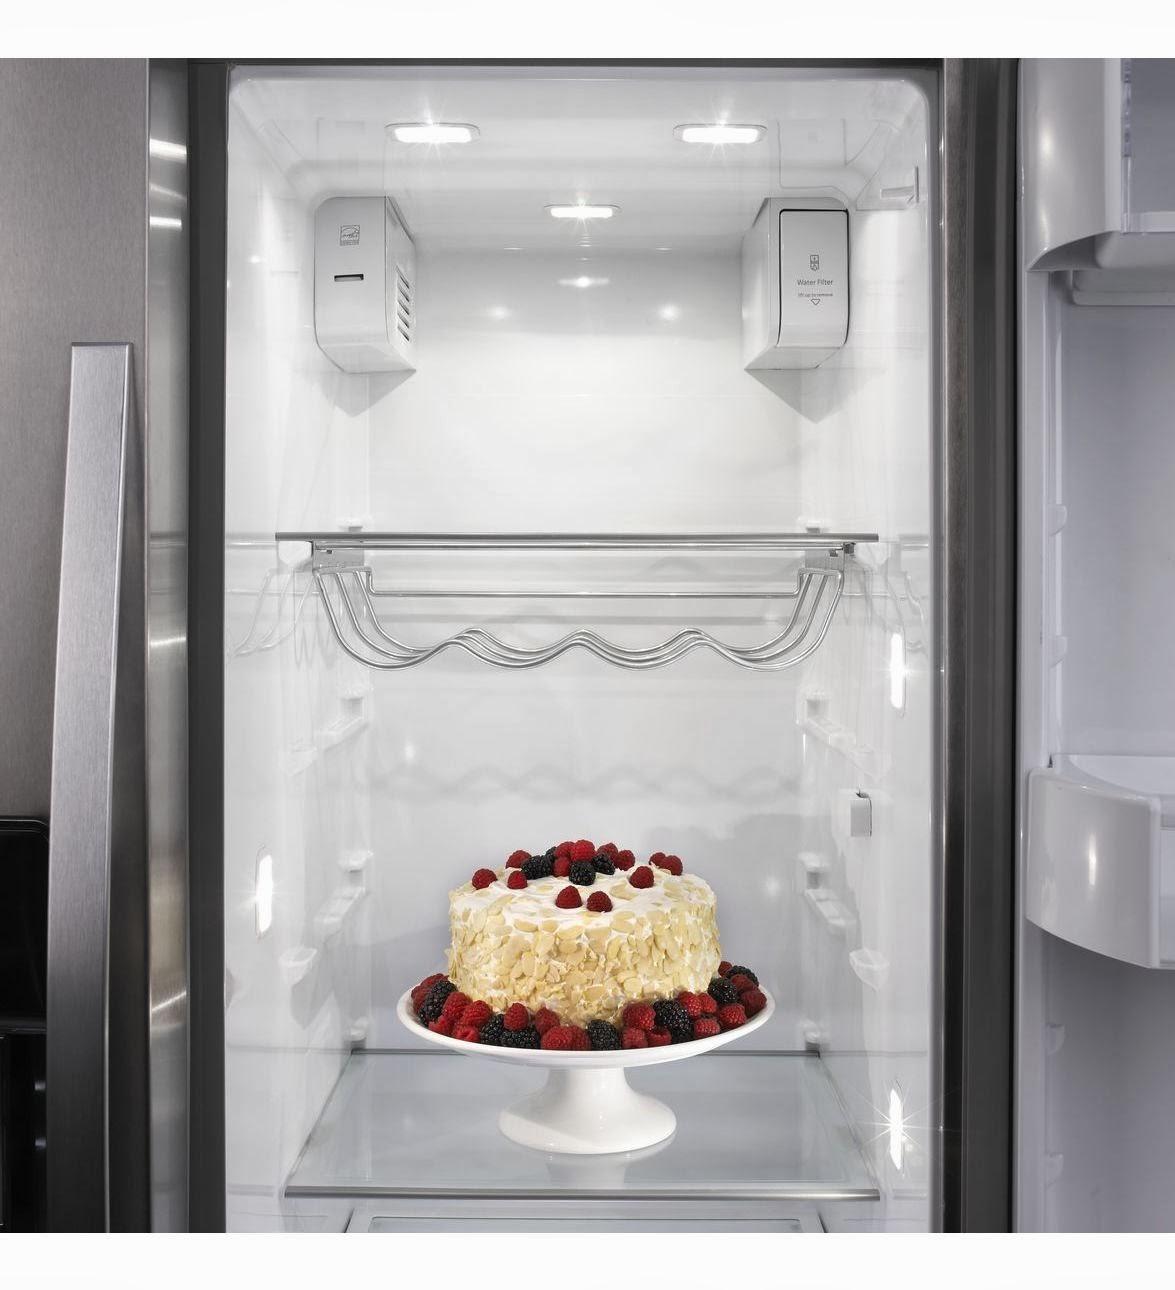 Whirlpool Refrigerator Brand: WRS950SIAE Refrigerators